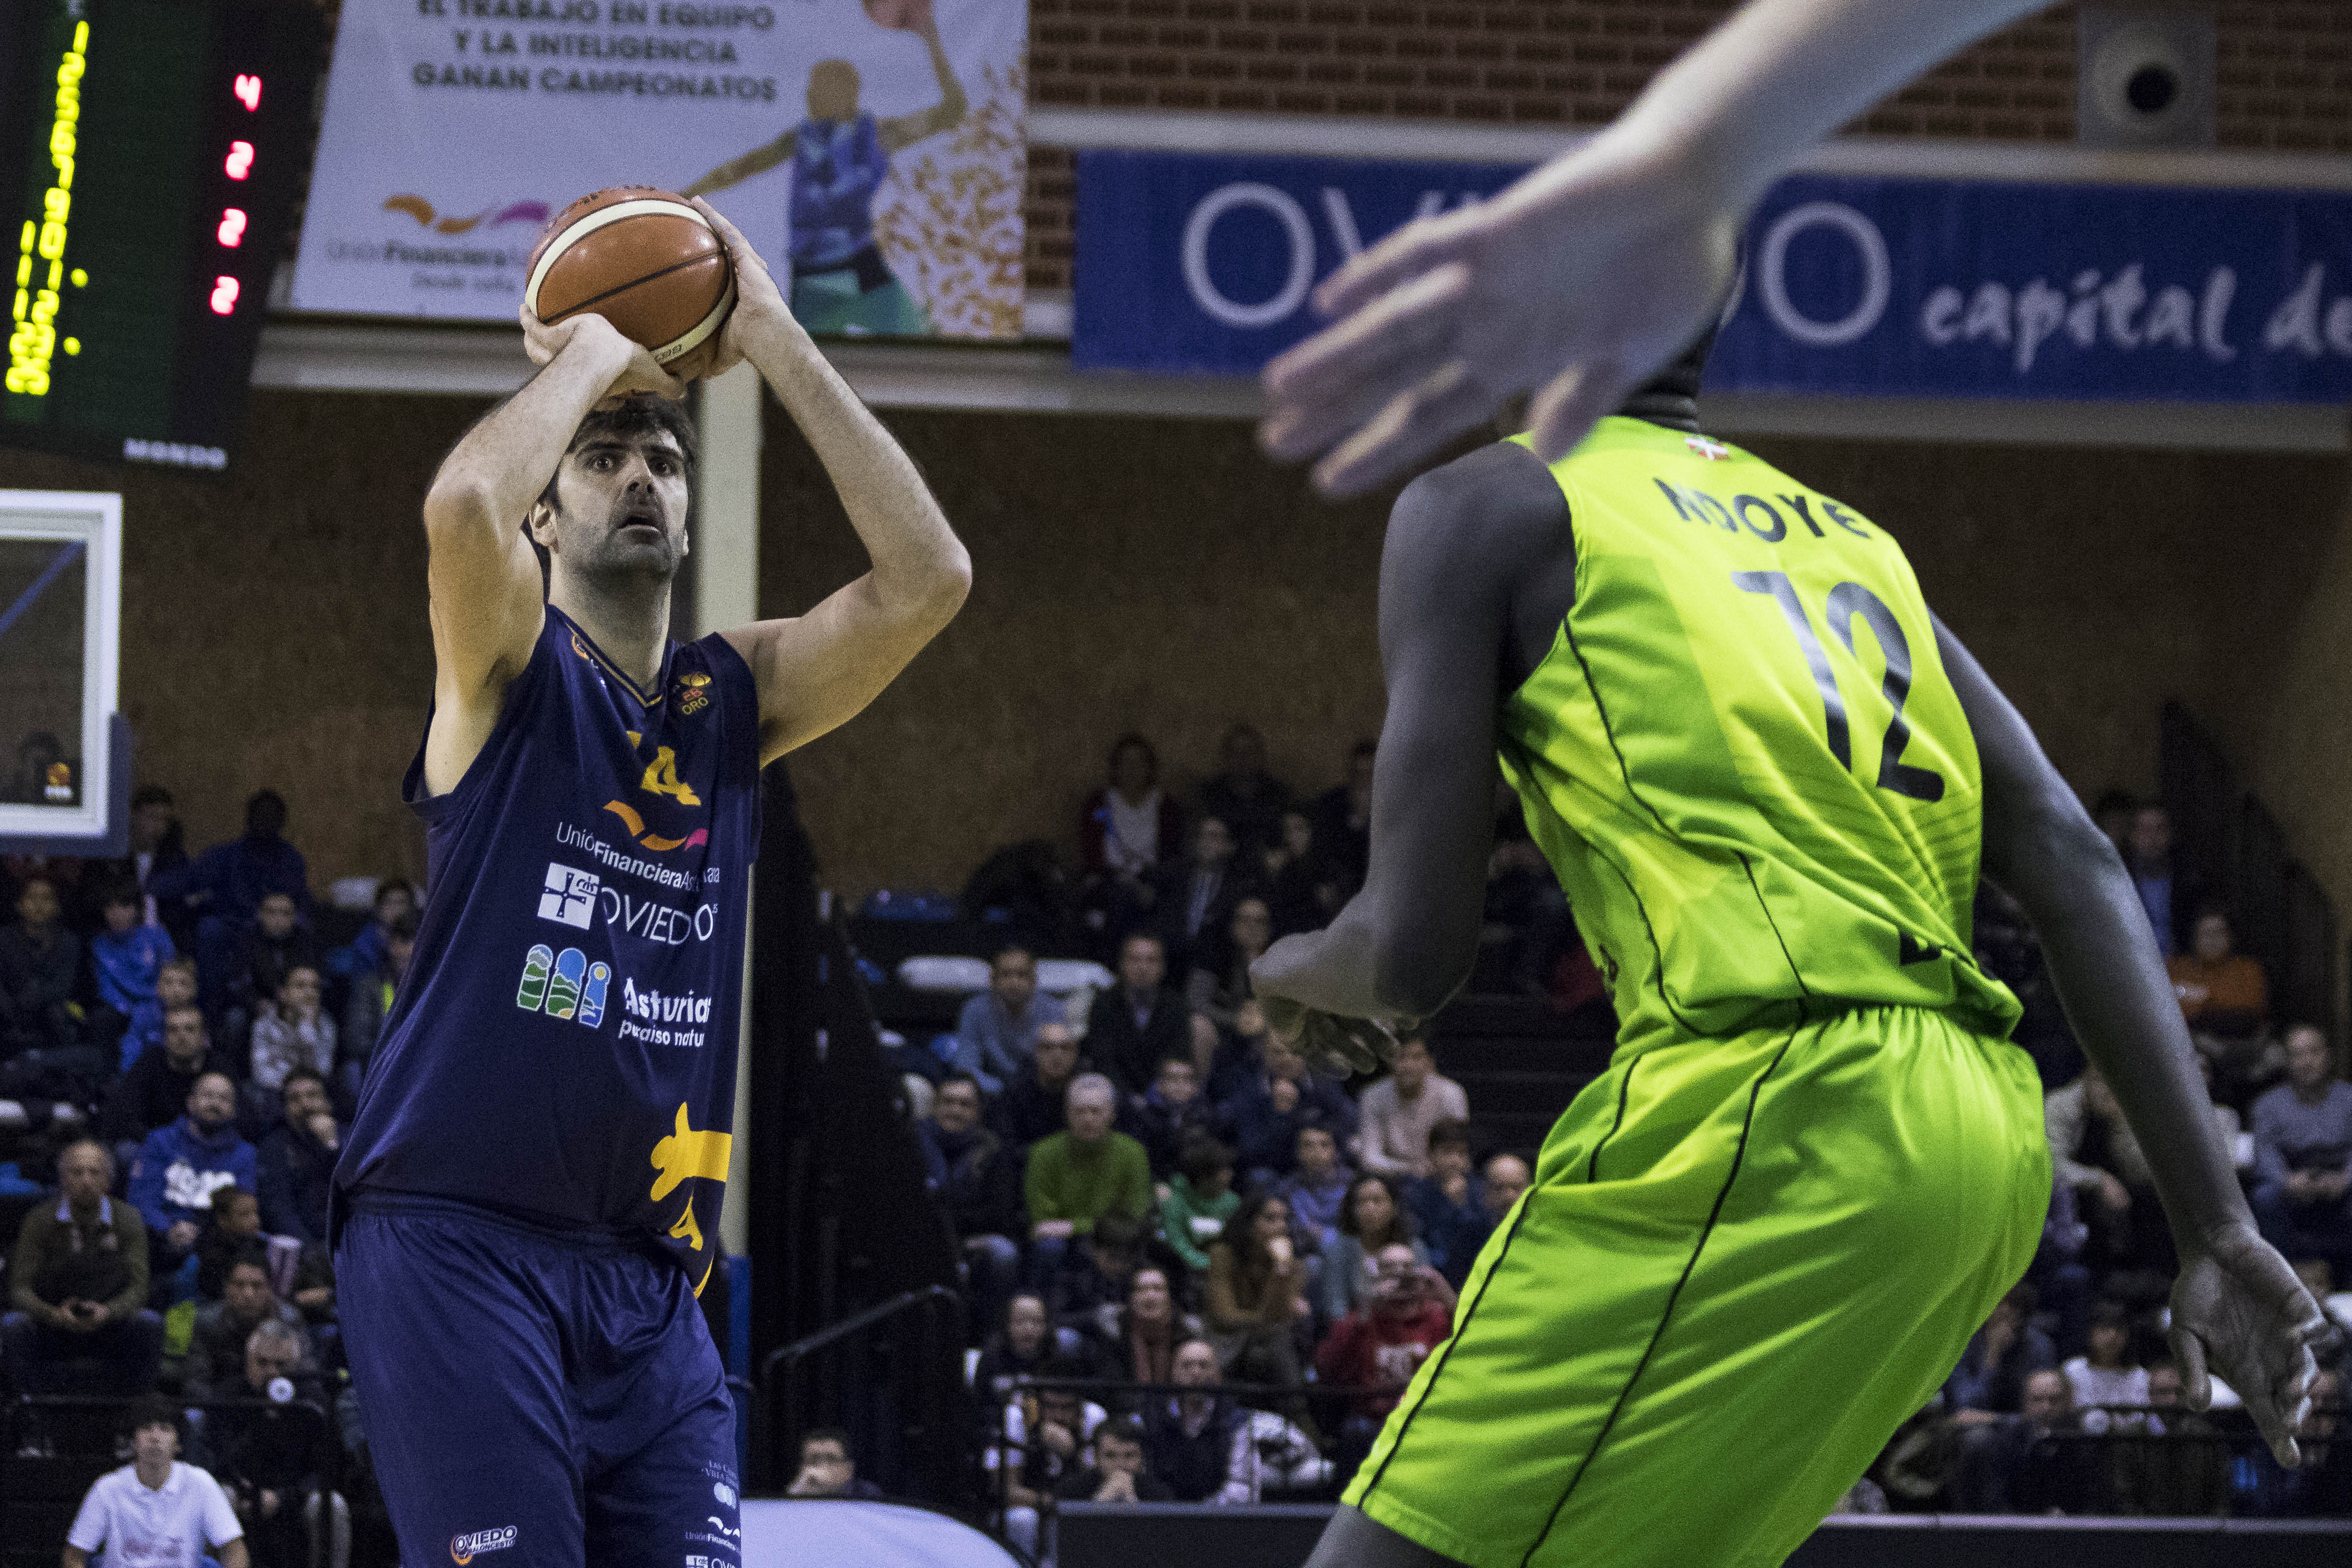 Eduardo Sonseca desde media distancia (Foto: Christian García)